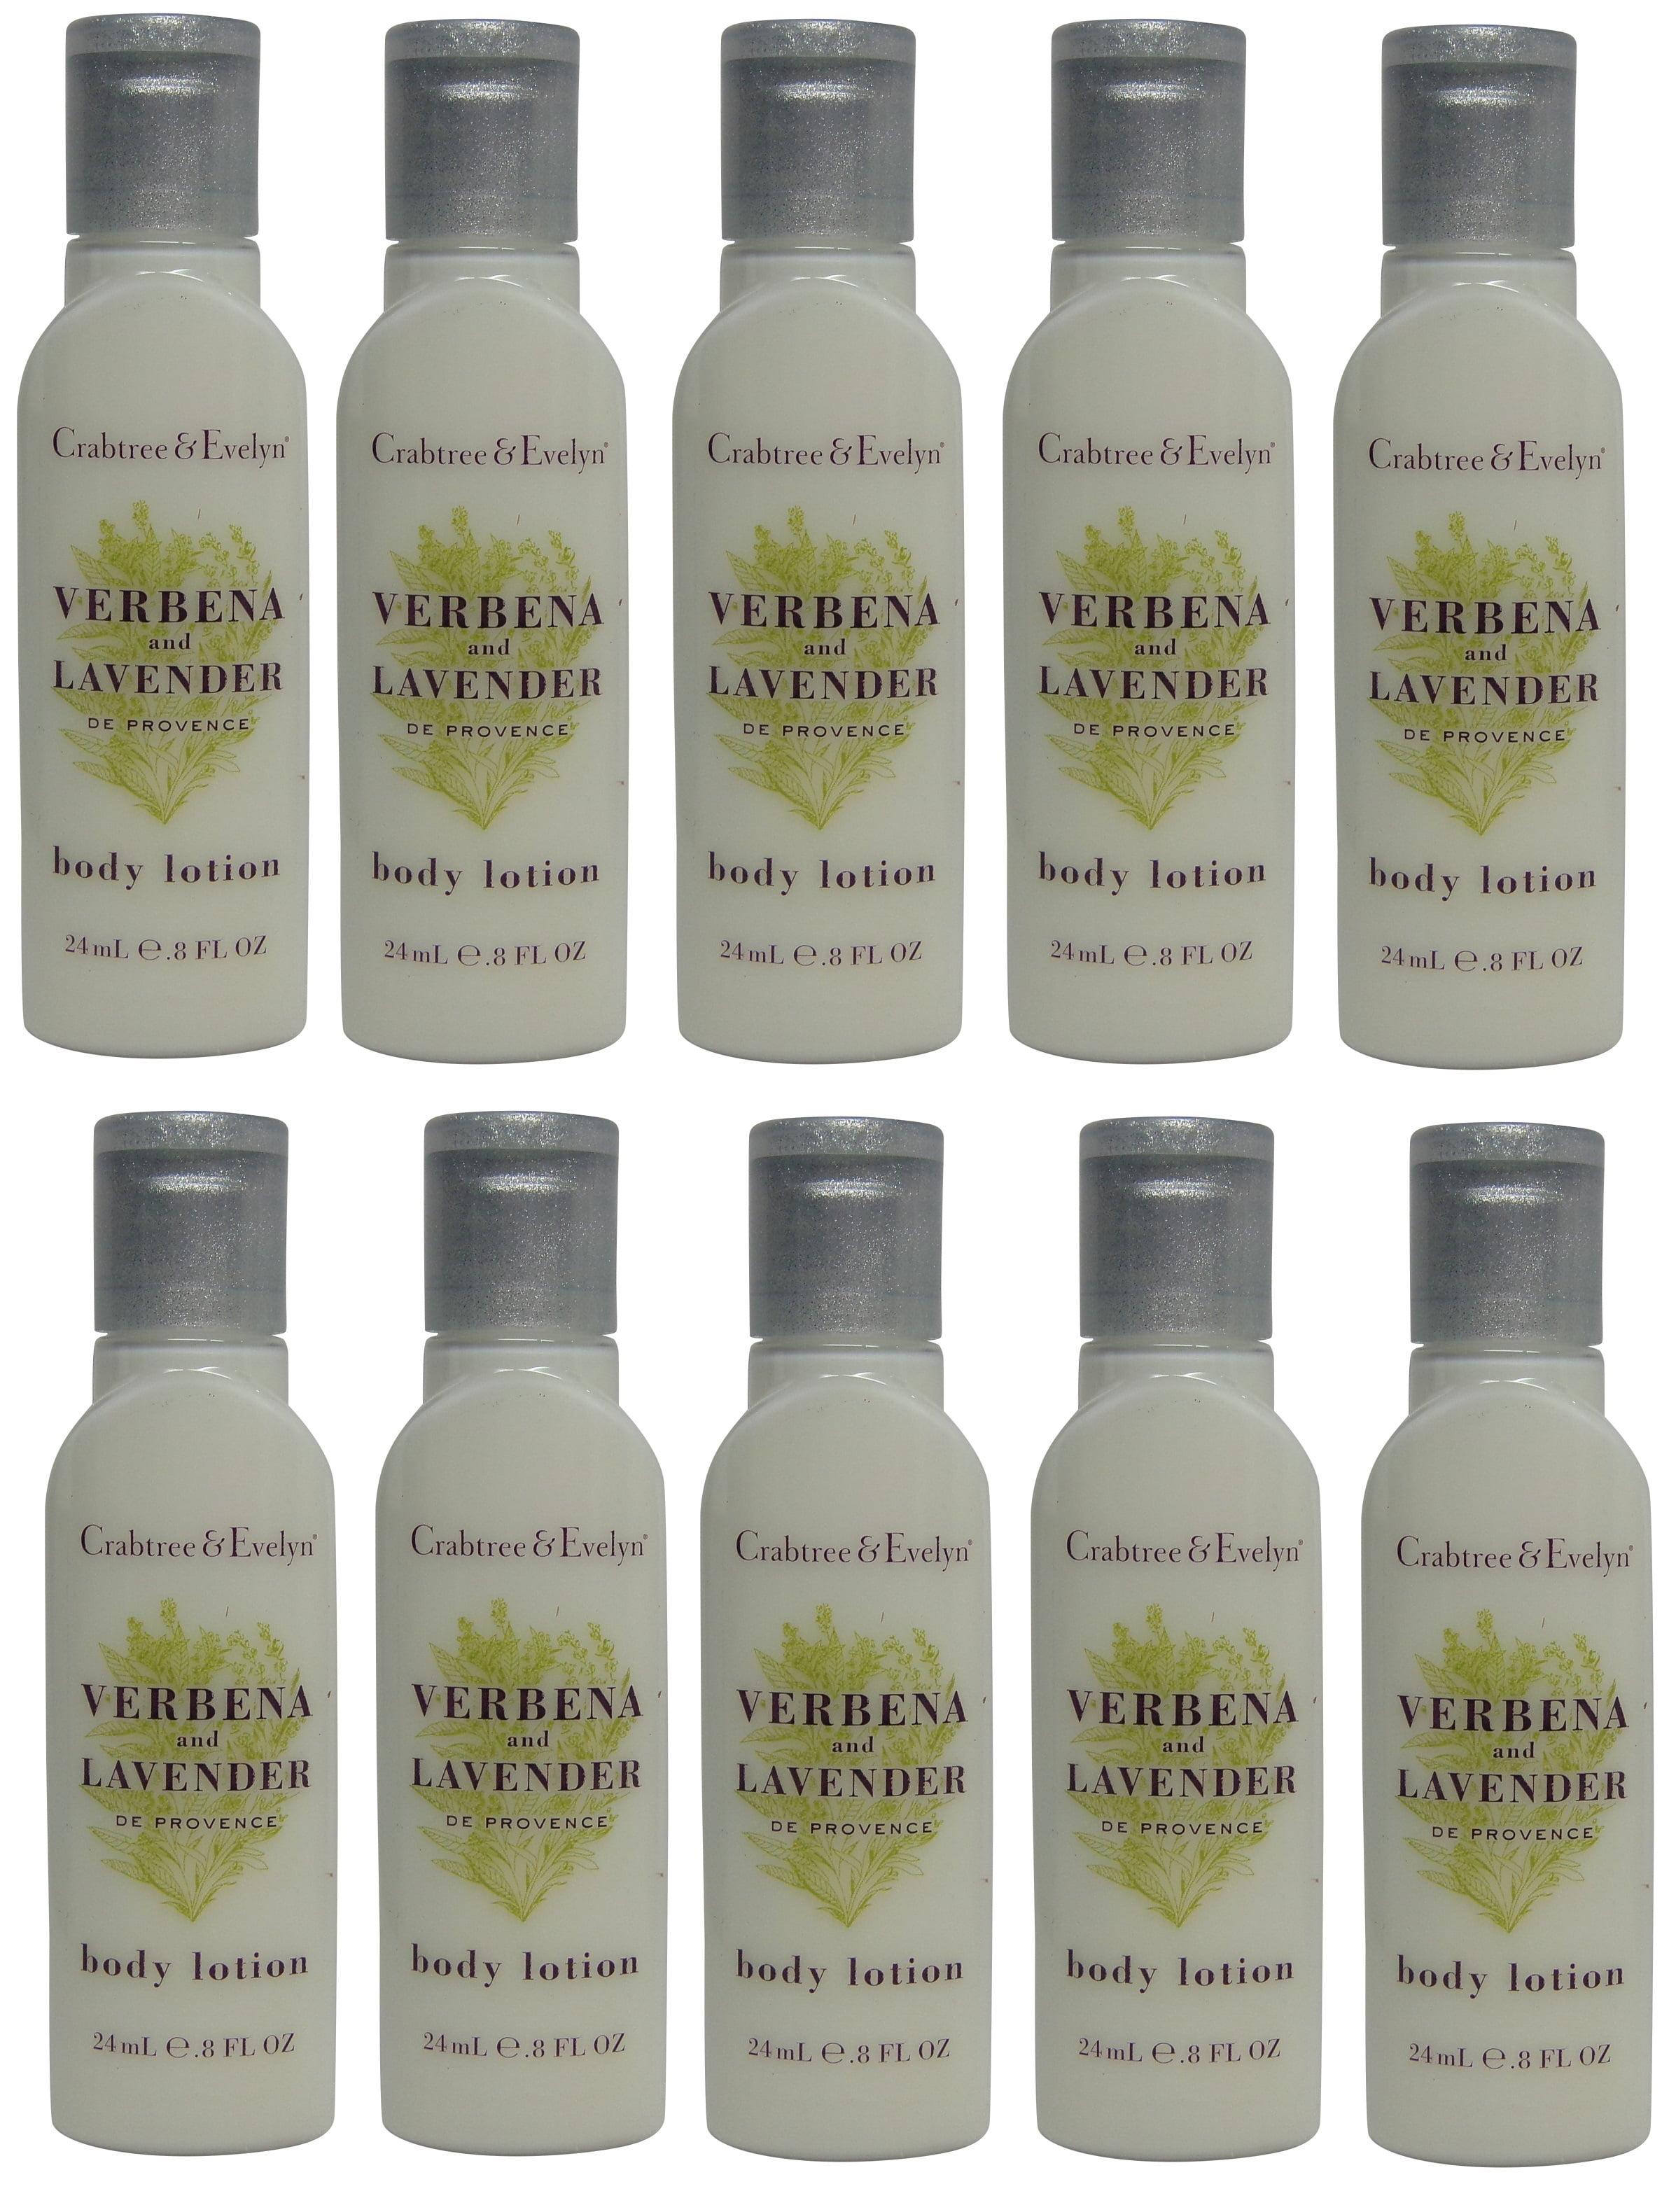 Crabtree & Evelyn Verbena & Lavender Body Lotion Lot of 10 each 0.8oz Bottles. Total of 8oz